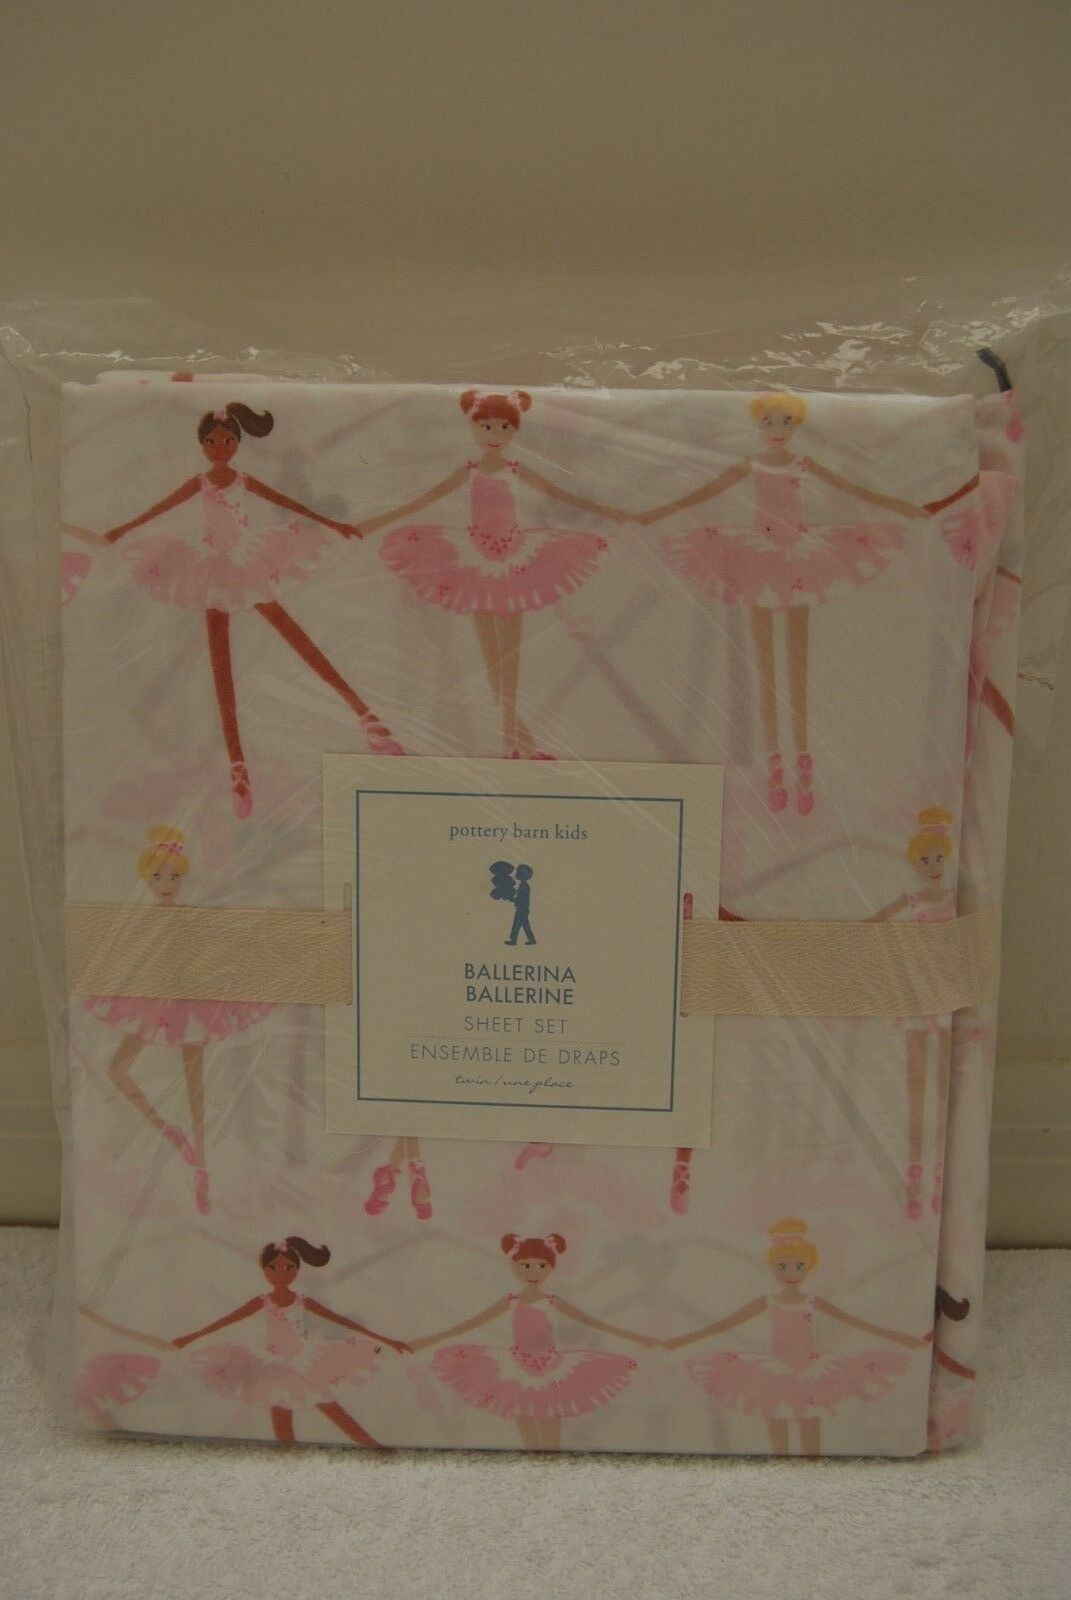 Nouveau POTTERY BARN Kids Rose ballerina TWIN Sheet Set 100% Coton Danseur de ballet